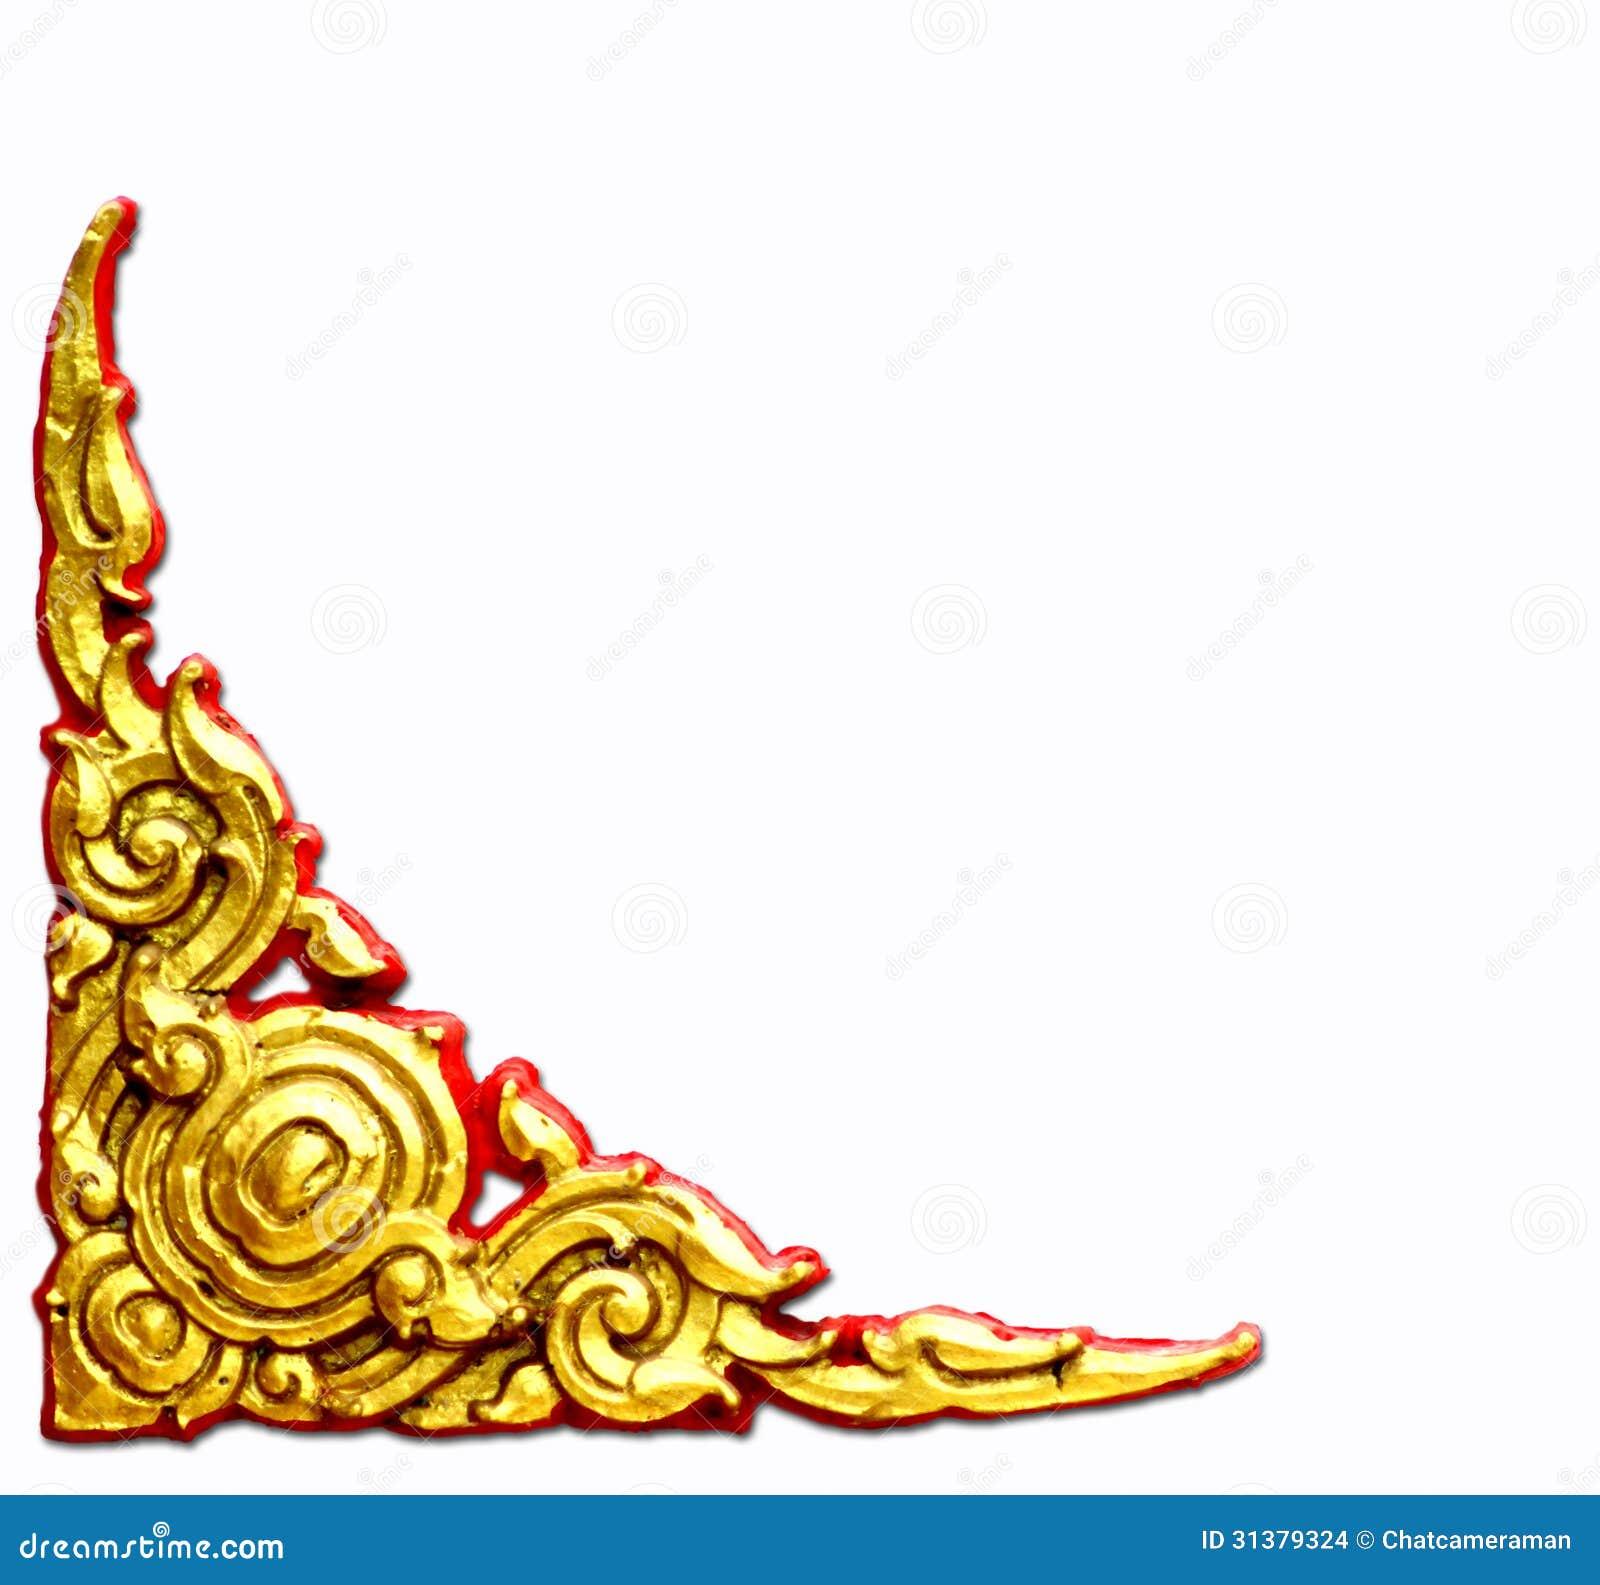 how to make golden colour